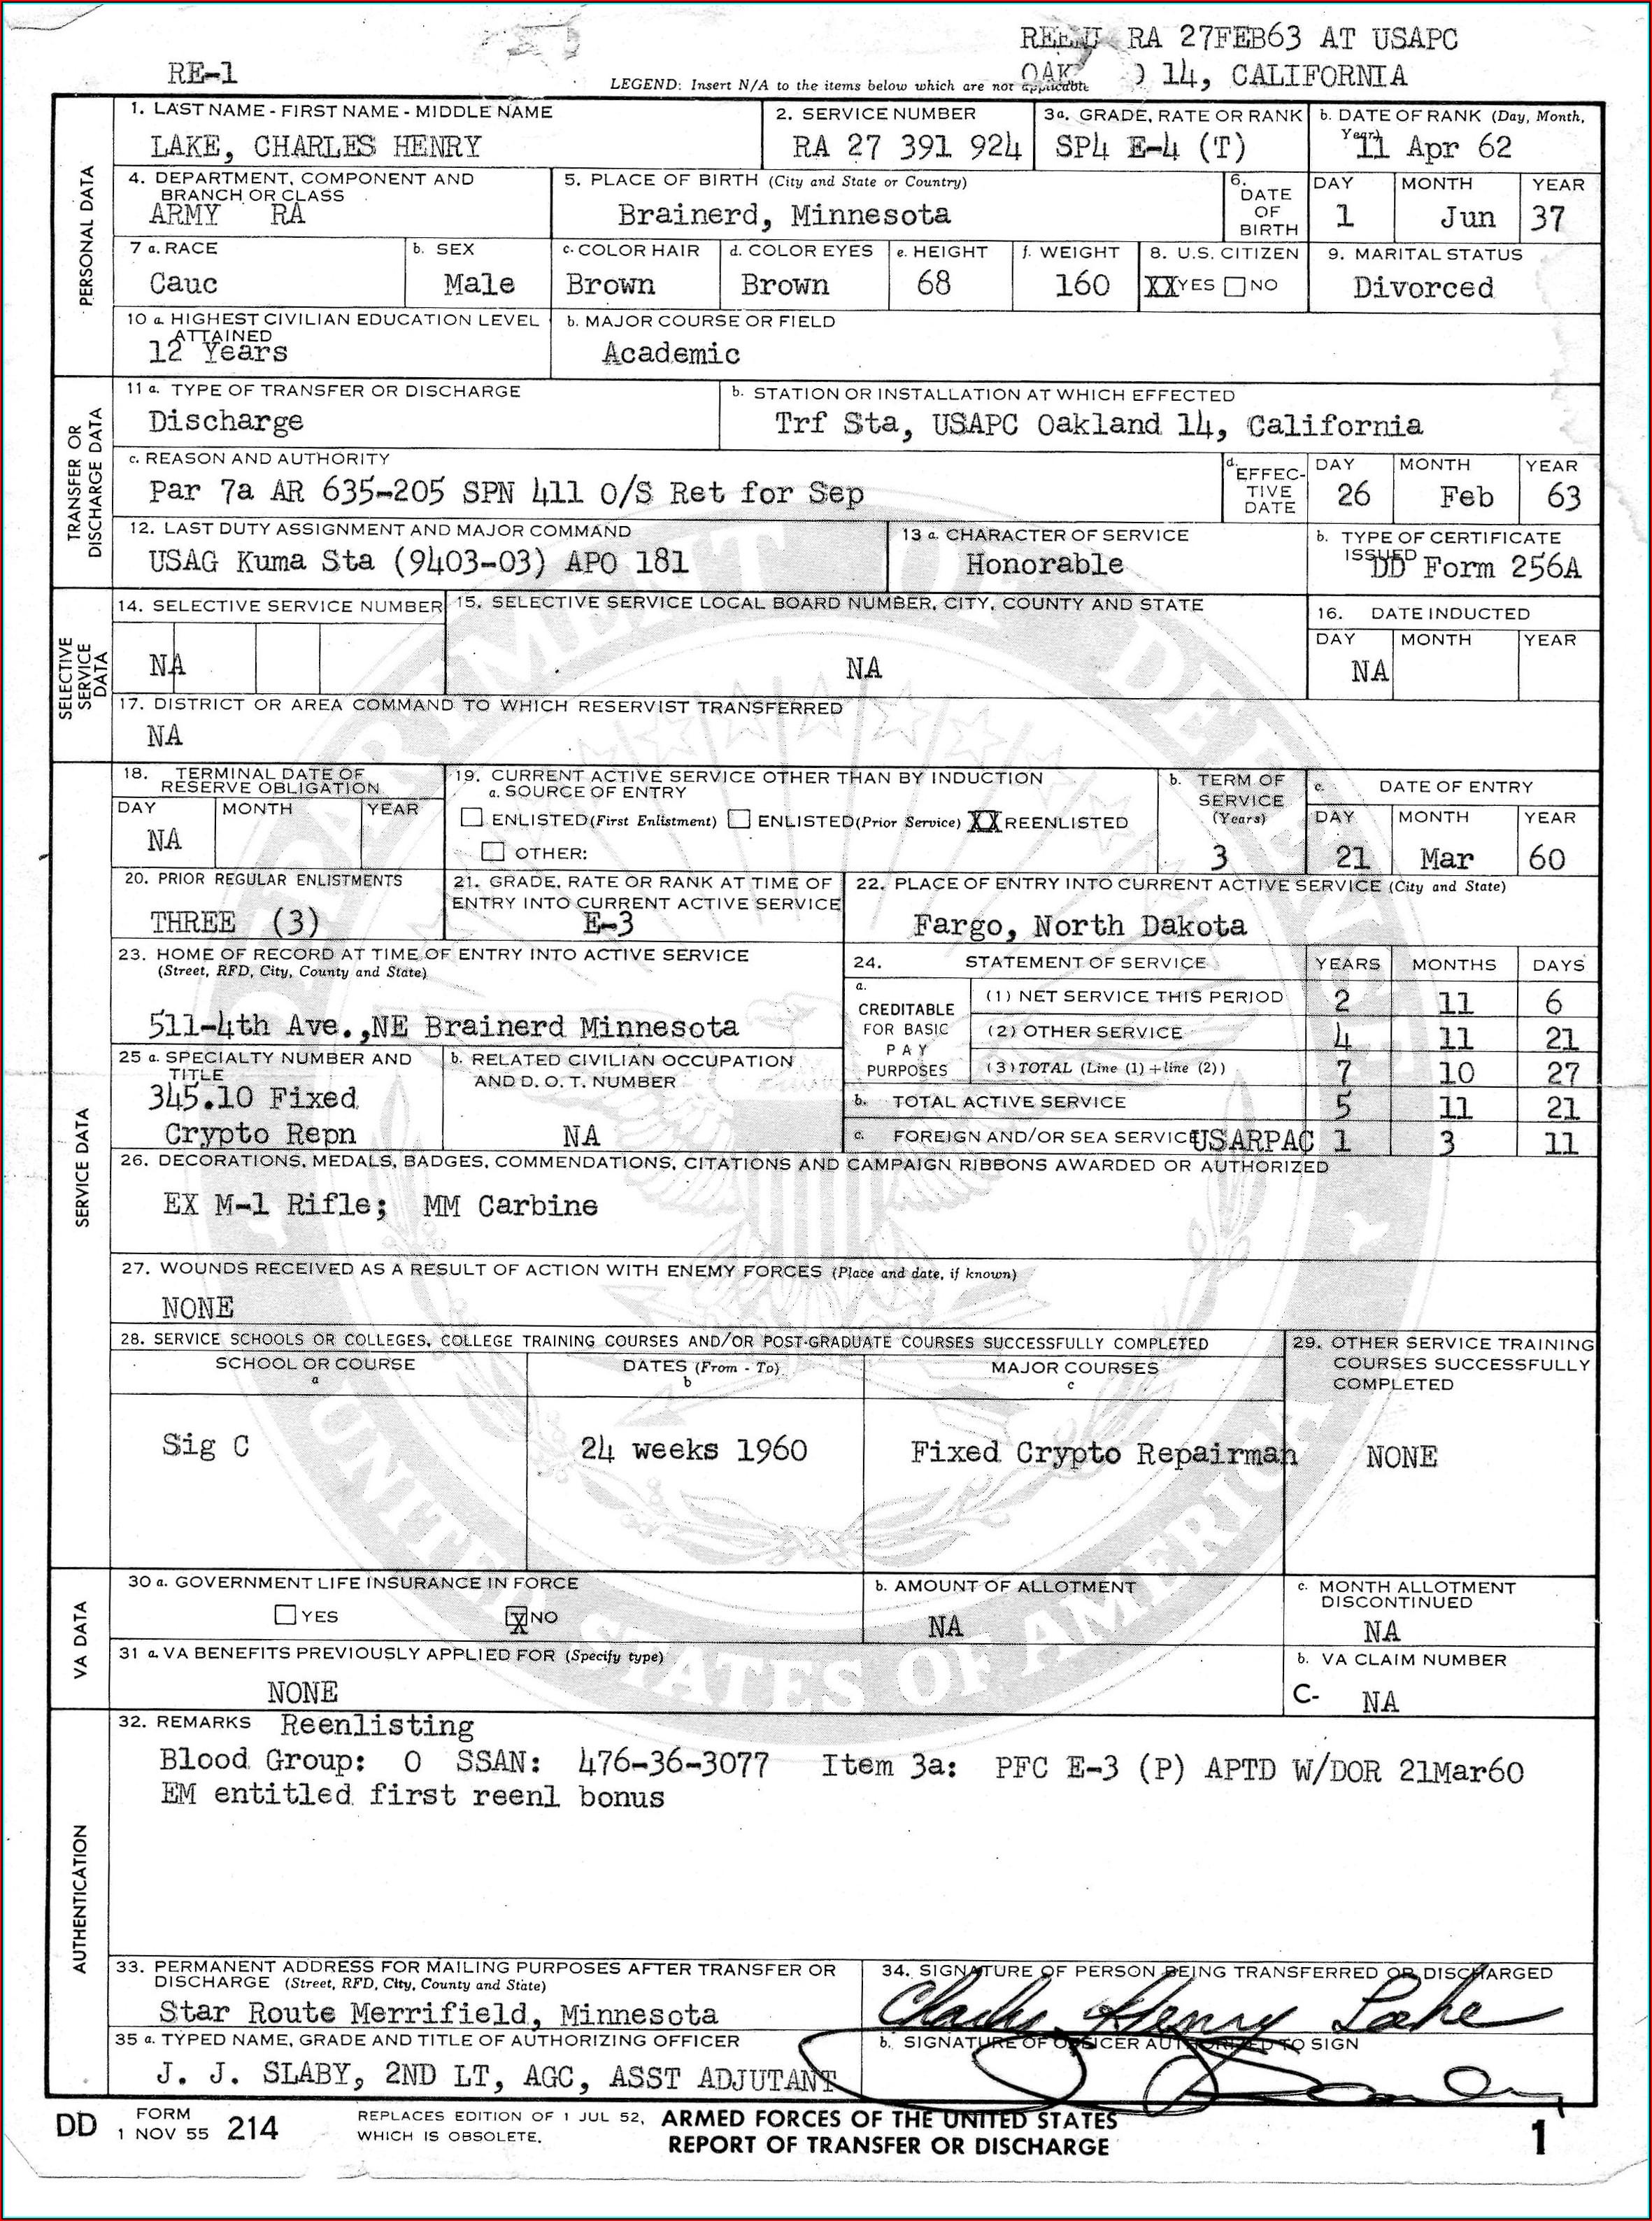 Copy Of Military Form Dd 214